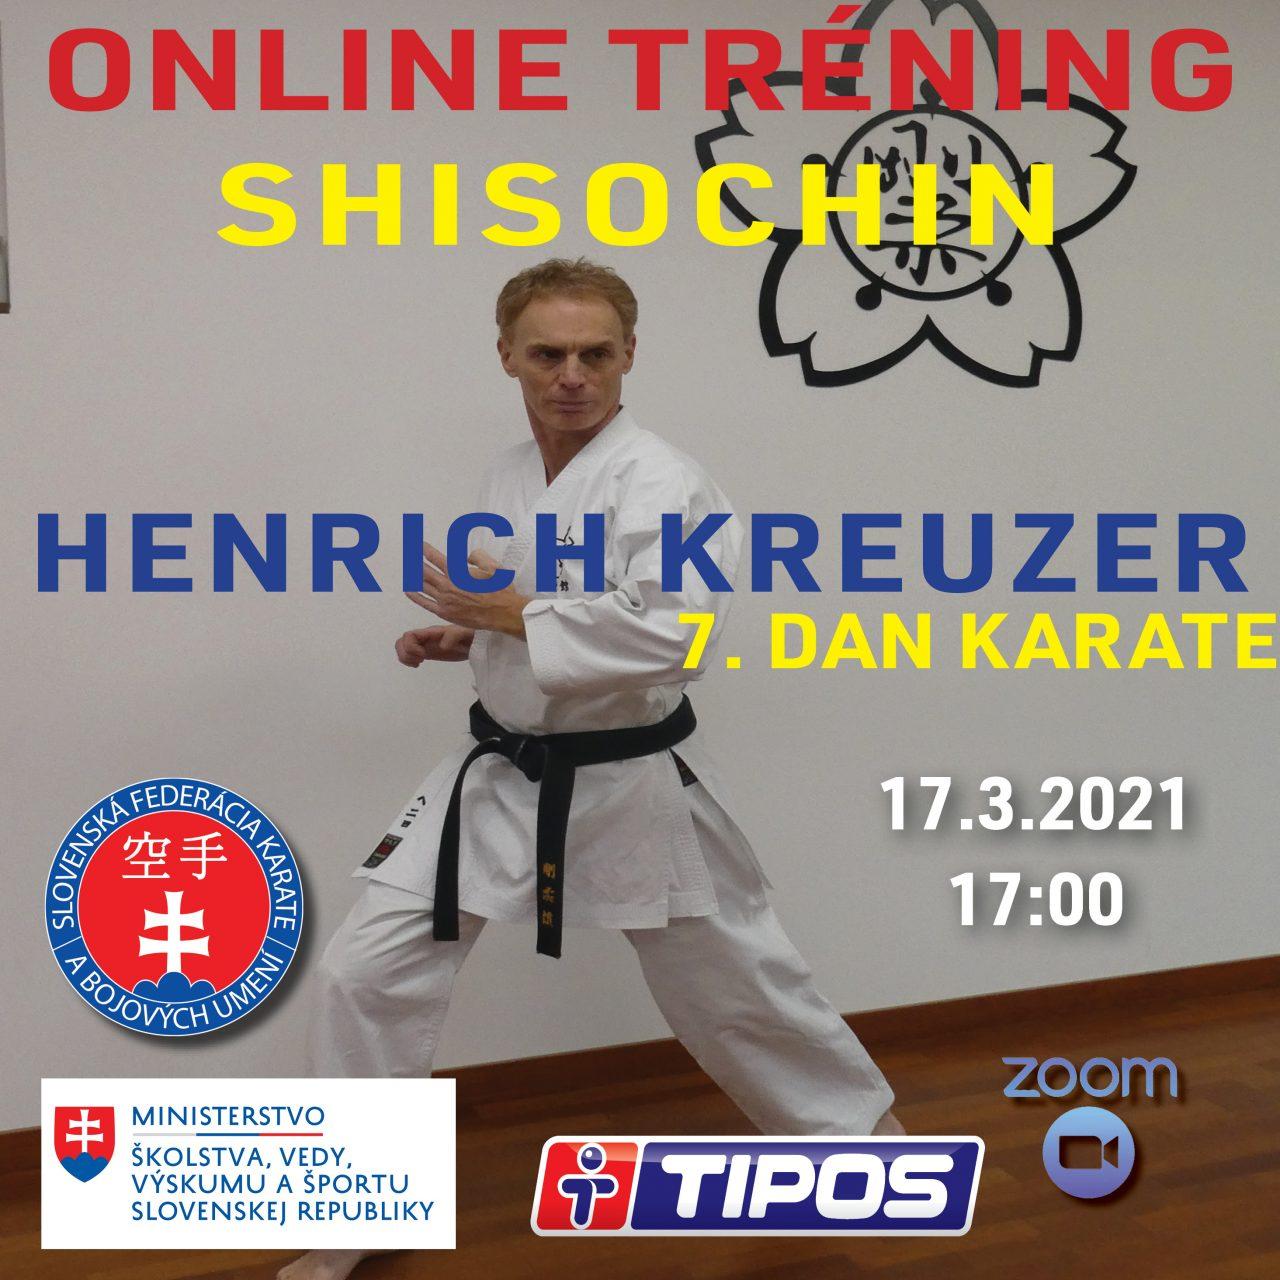 https://karate-slovakia.sk/wp-content/uploads/Kreuzer_FB2-1280x1280.jpg